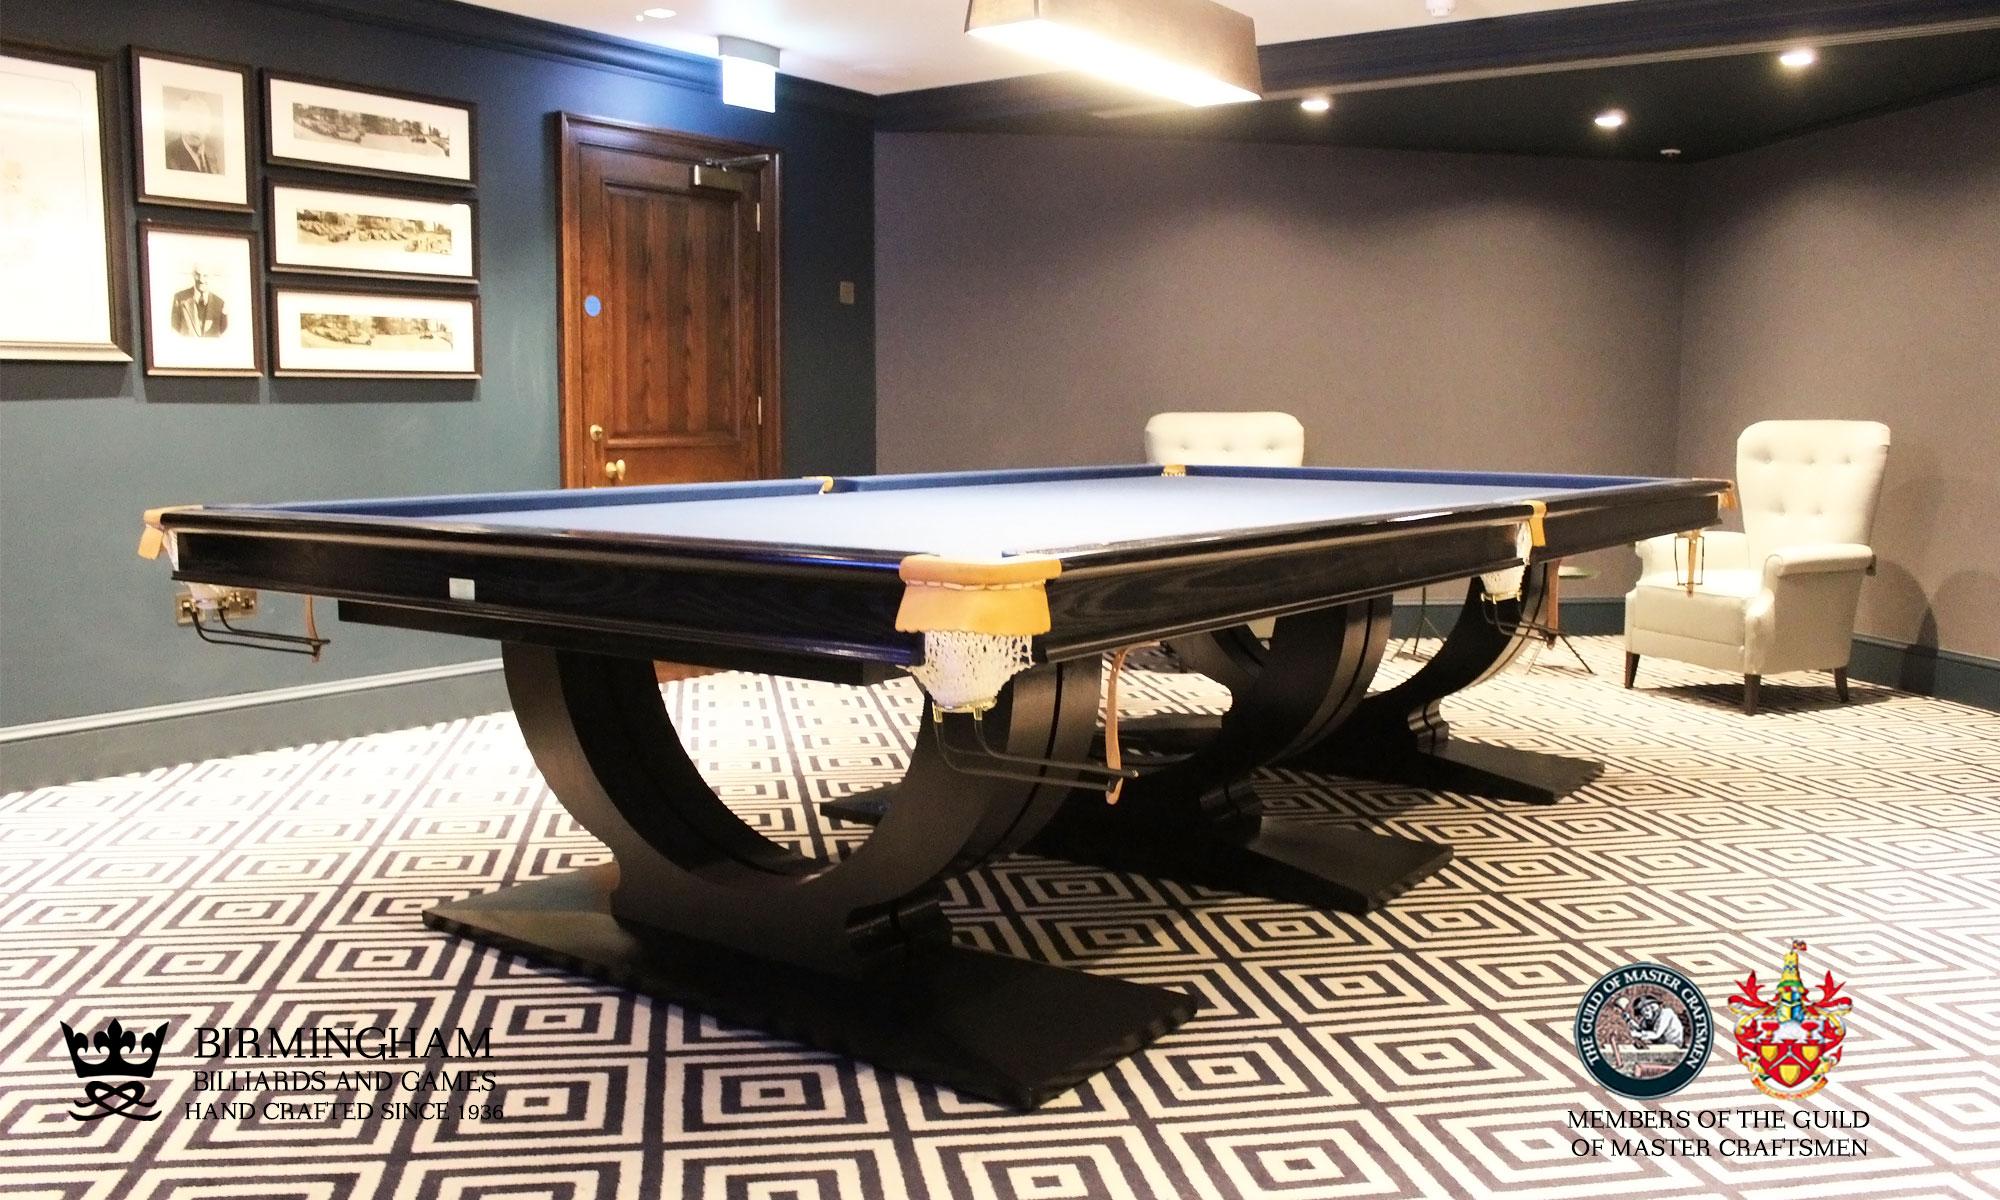 Roma art deco snooker table